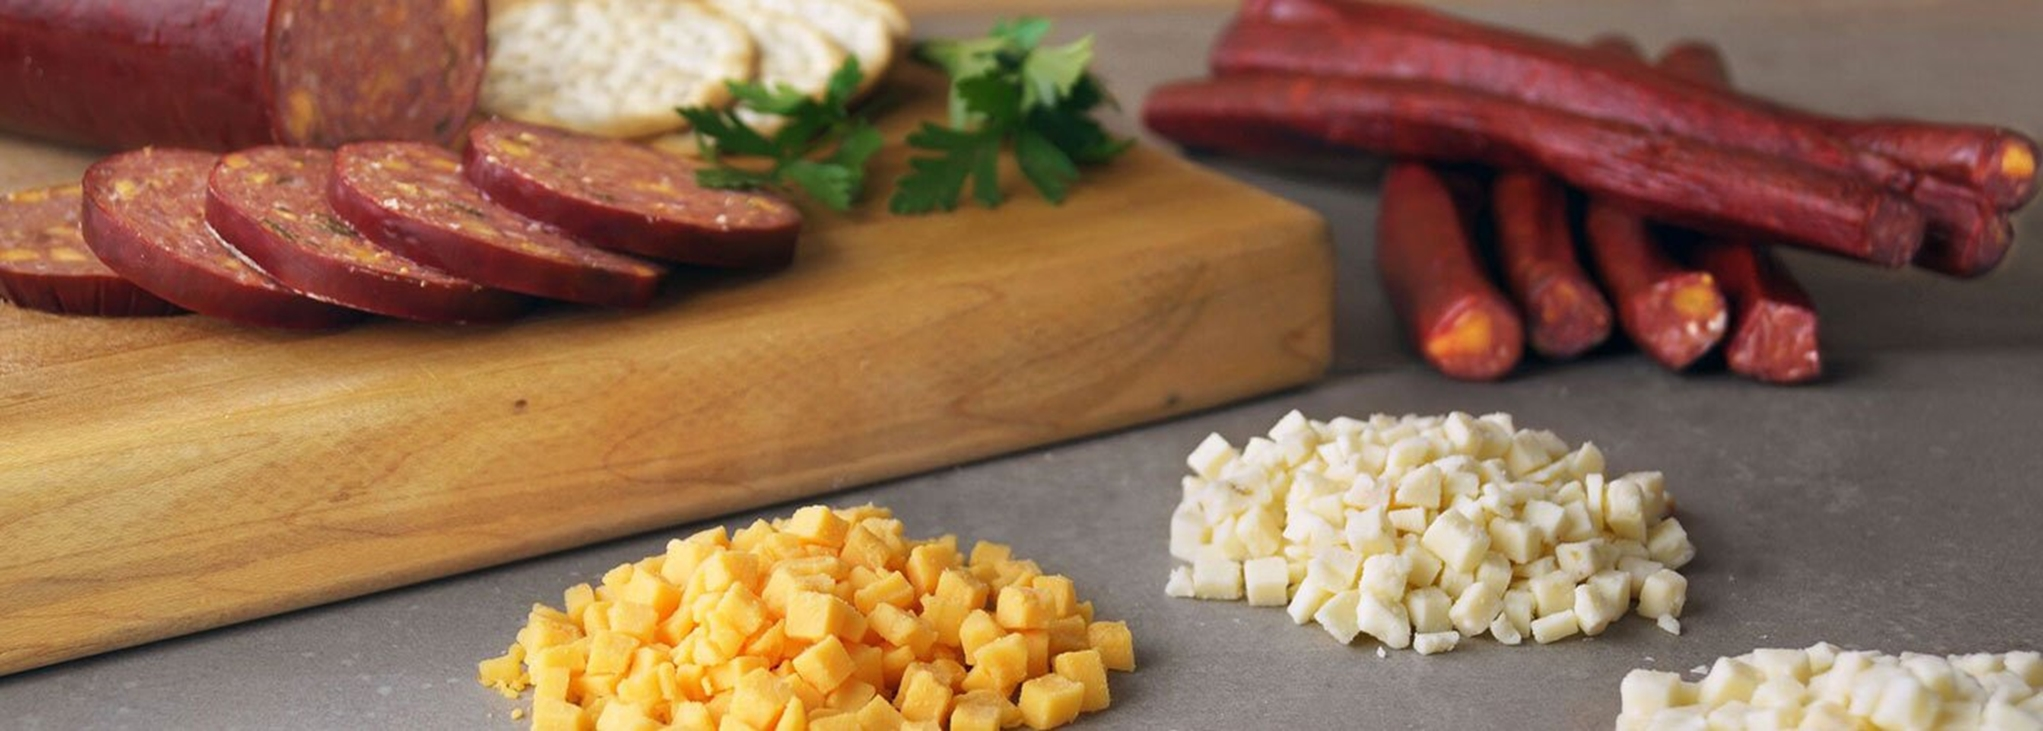 cheeses-1400x.jpg